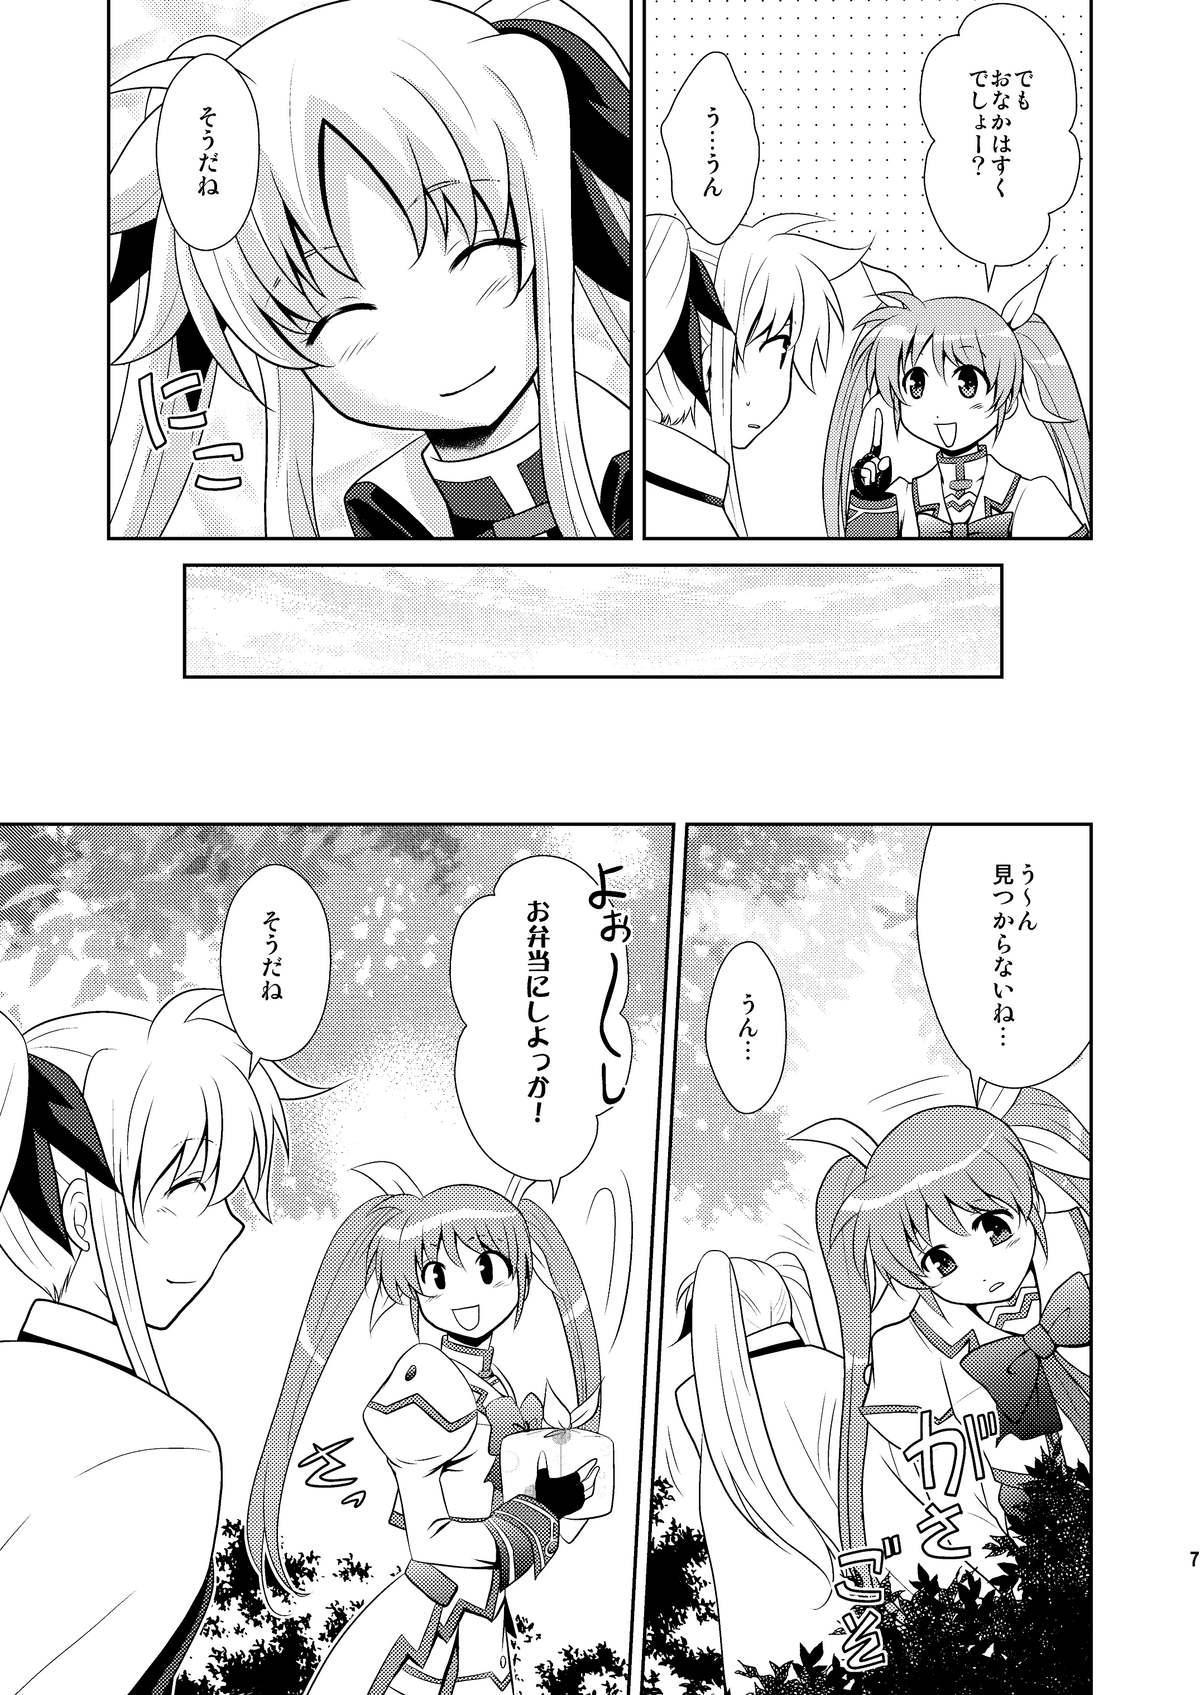 W Fate-san 6